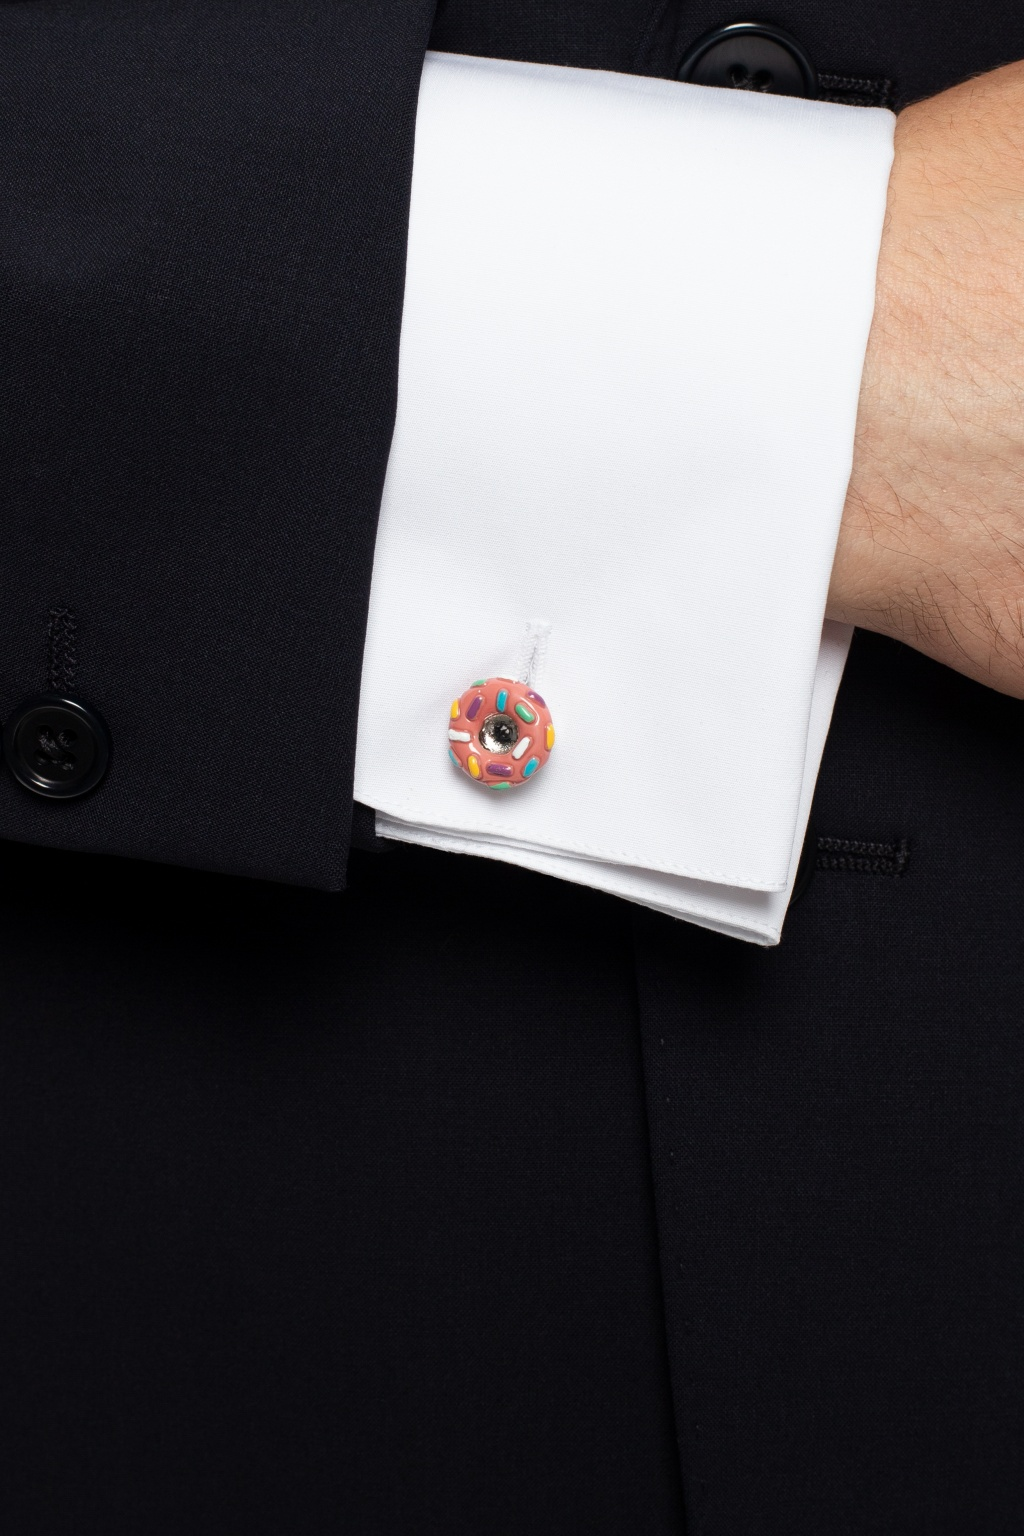 Paul Smith Donut cuff links